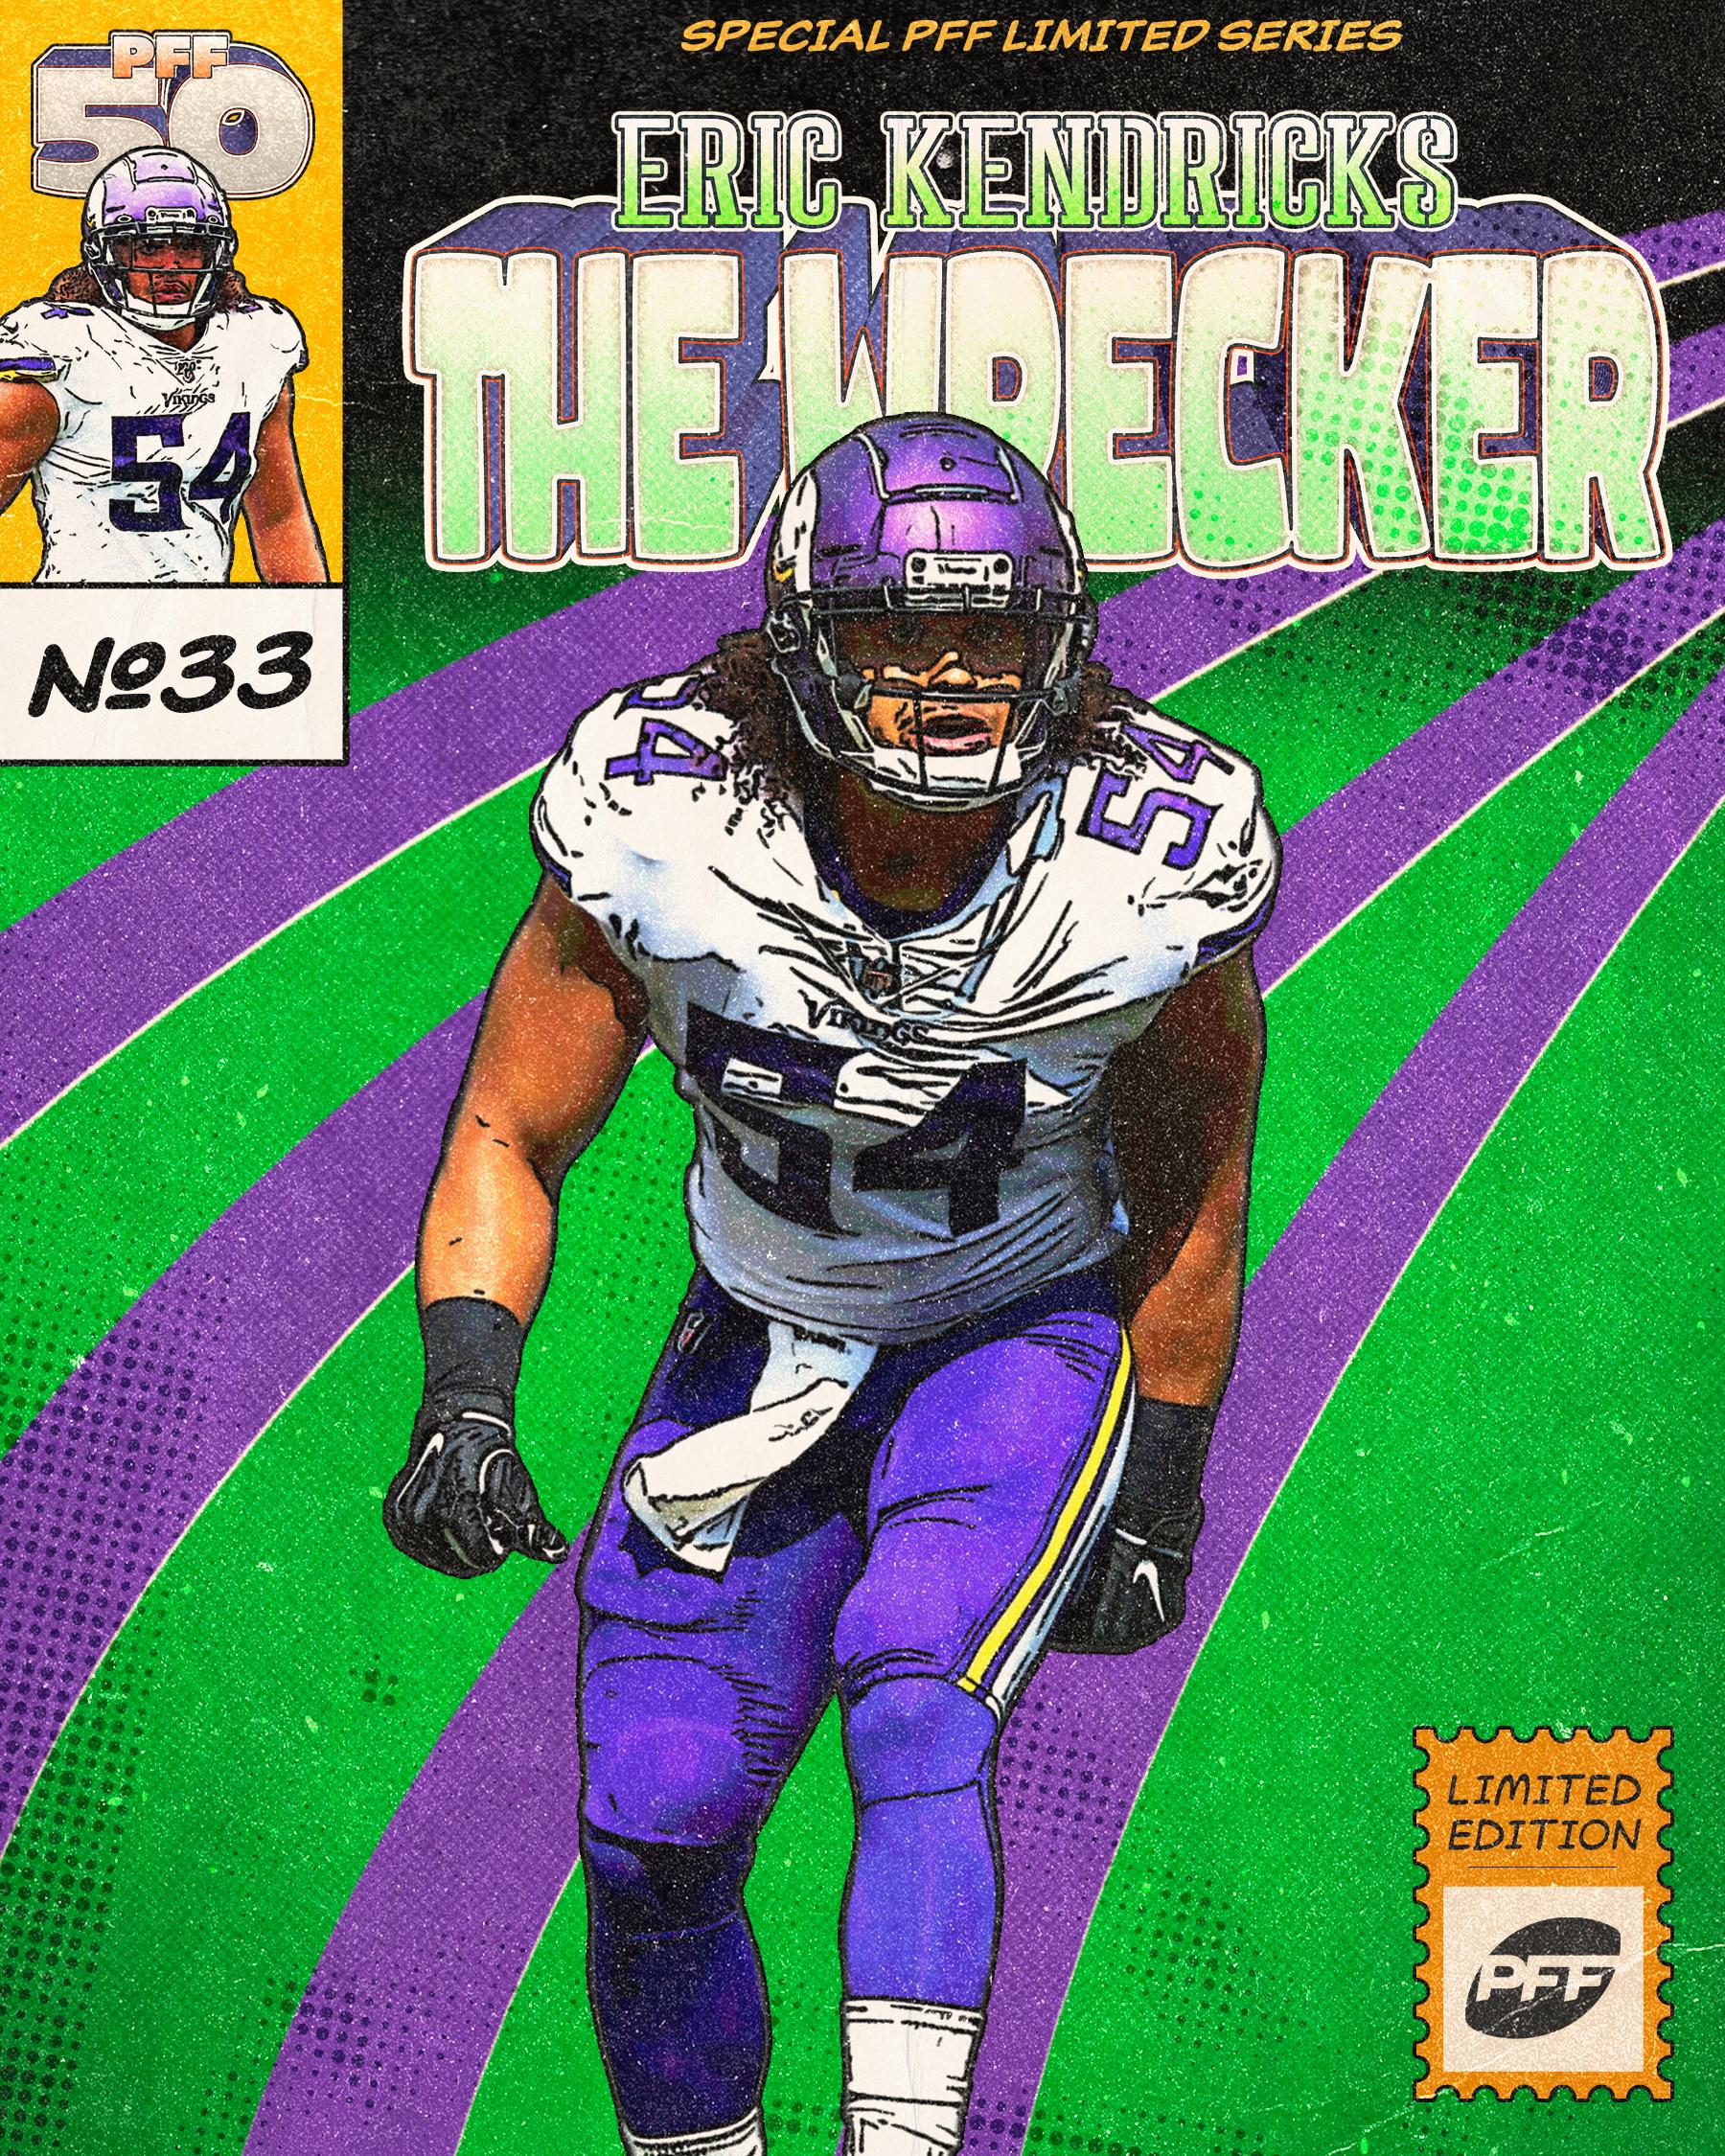 Minnesota Vikings LB Eric Kendricks